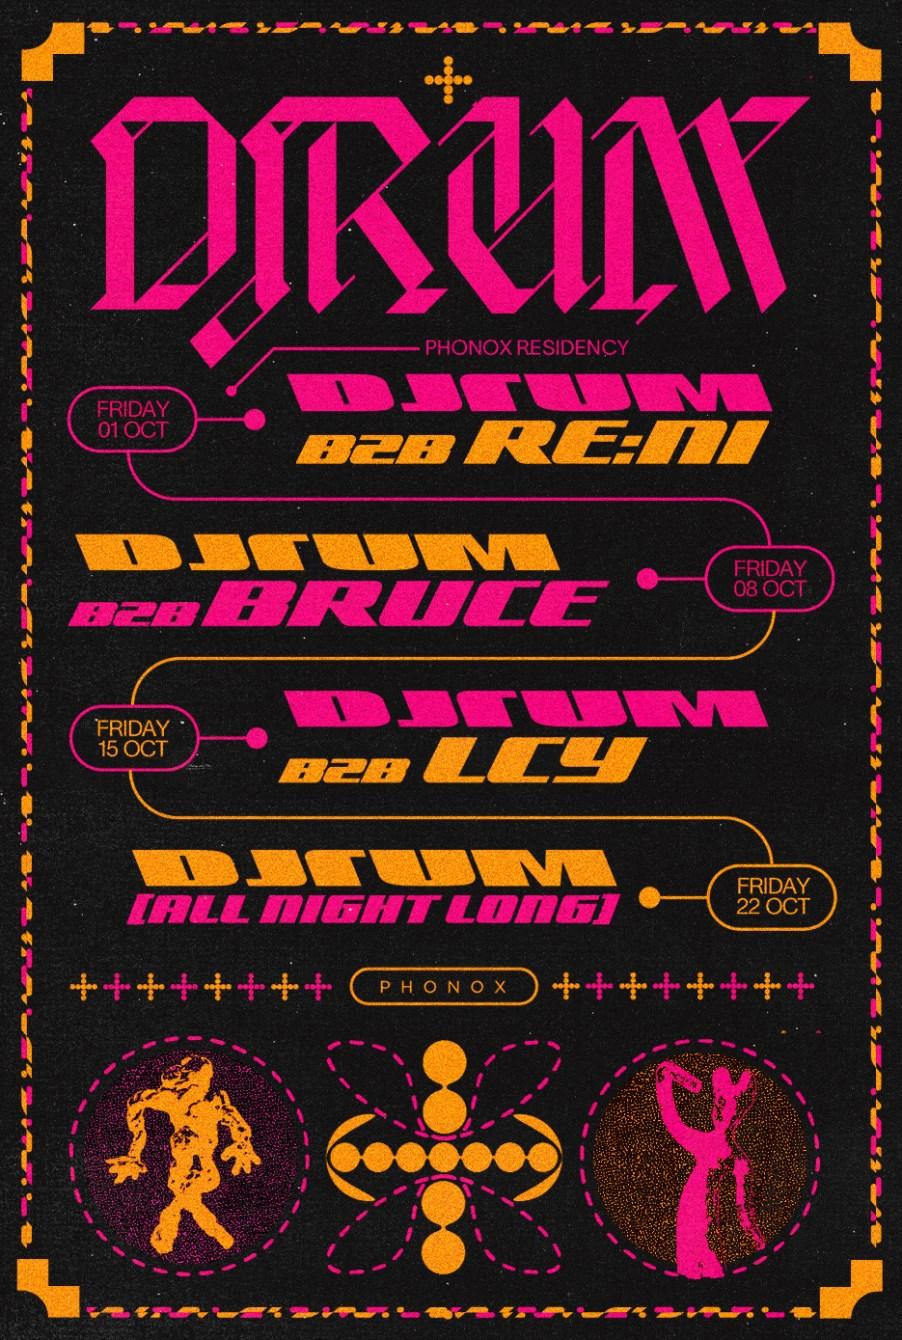 DjRUM [4 Fridays at Phonox] b2b LCY - Flyer front